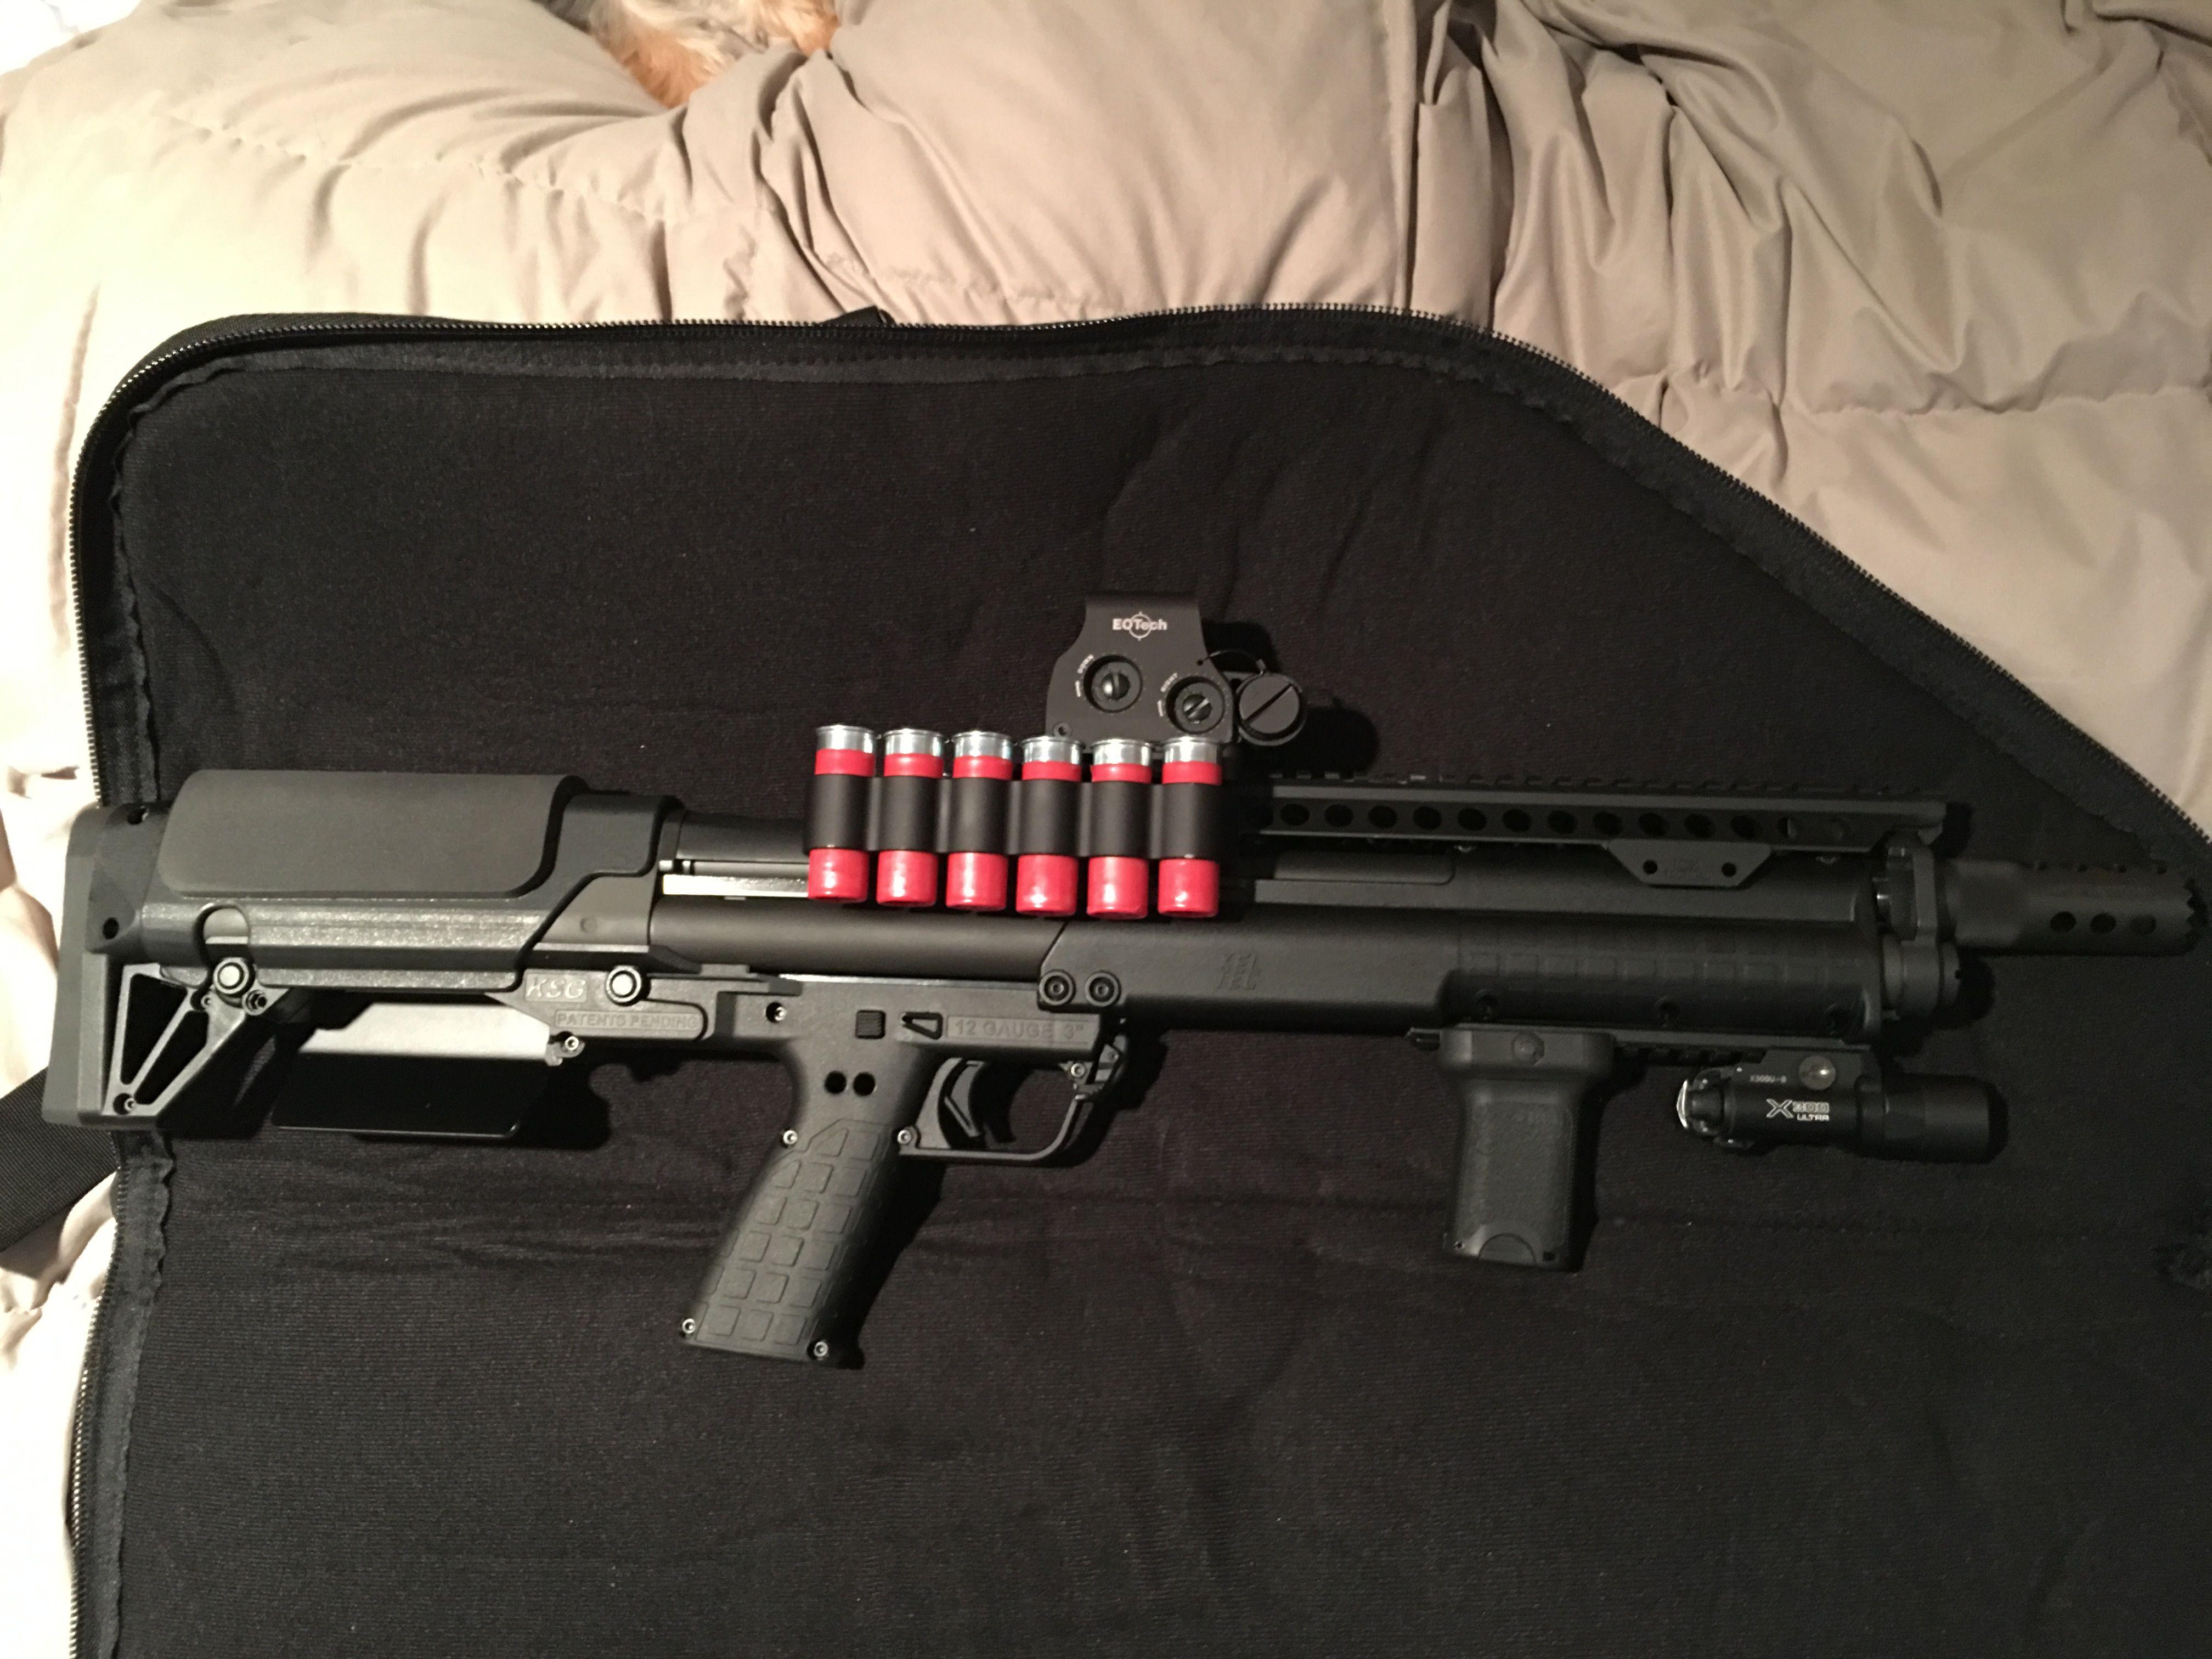 Fully Decked Out Keltec Ksg Tactical Shotgun Tiger Shotgunworldcom O Wingmaster Trigger Help Please